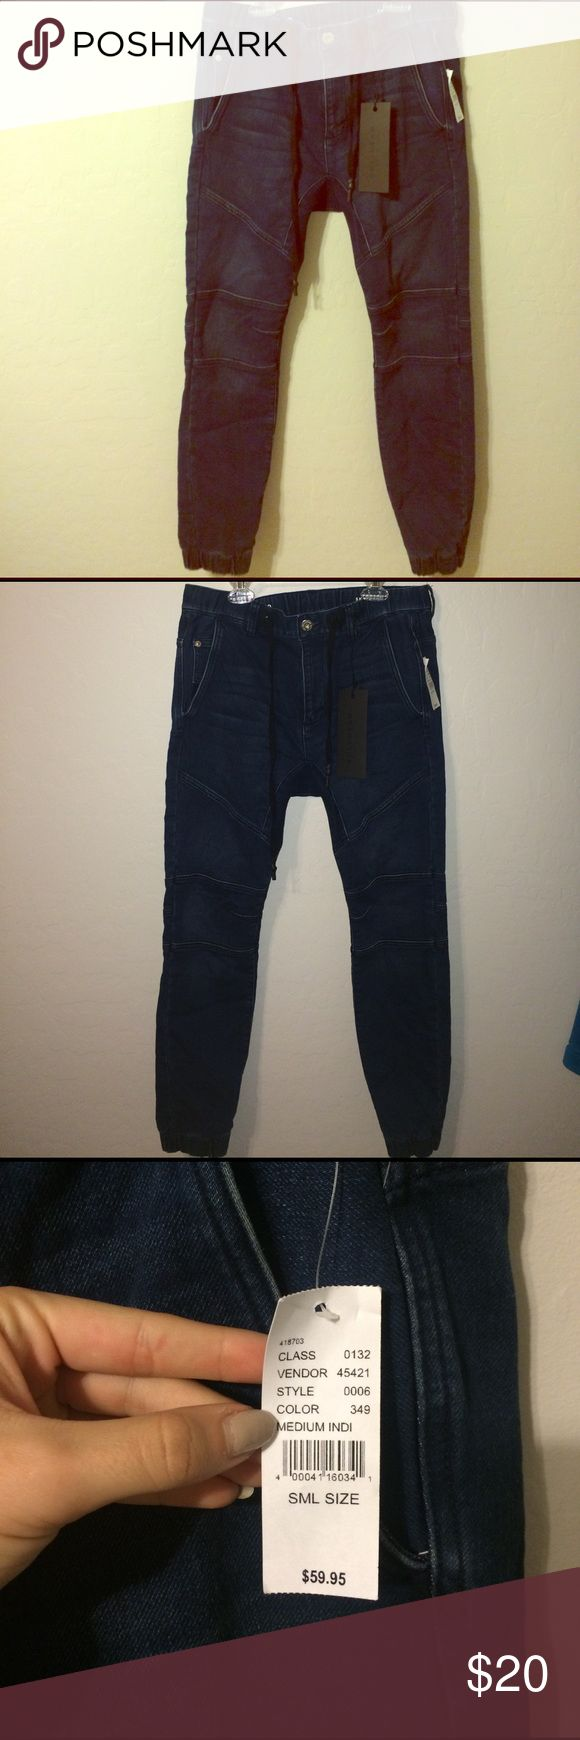 Men's Bullhead skinny jeans - small Men's bullhead skinny jean! Has a cuffed bottom similar to sweatpants, cool design on the legs. Never worn still has tags! Dark wash Bullhead Jeans Skinny